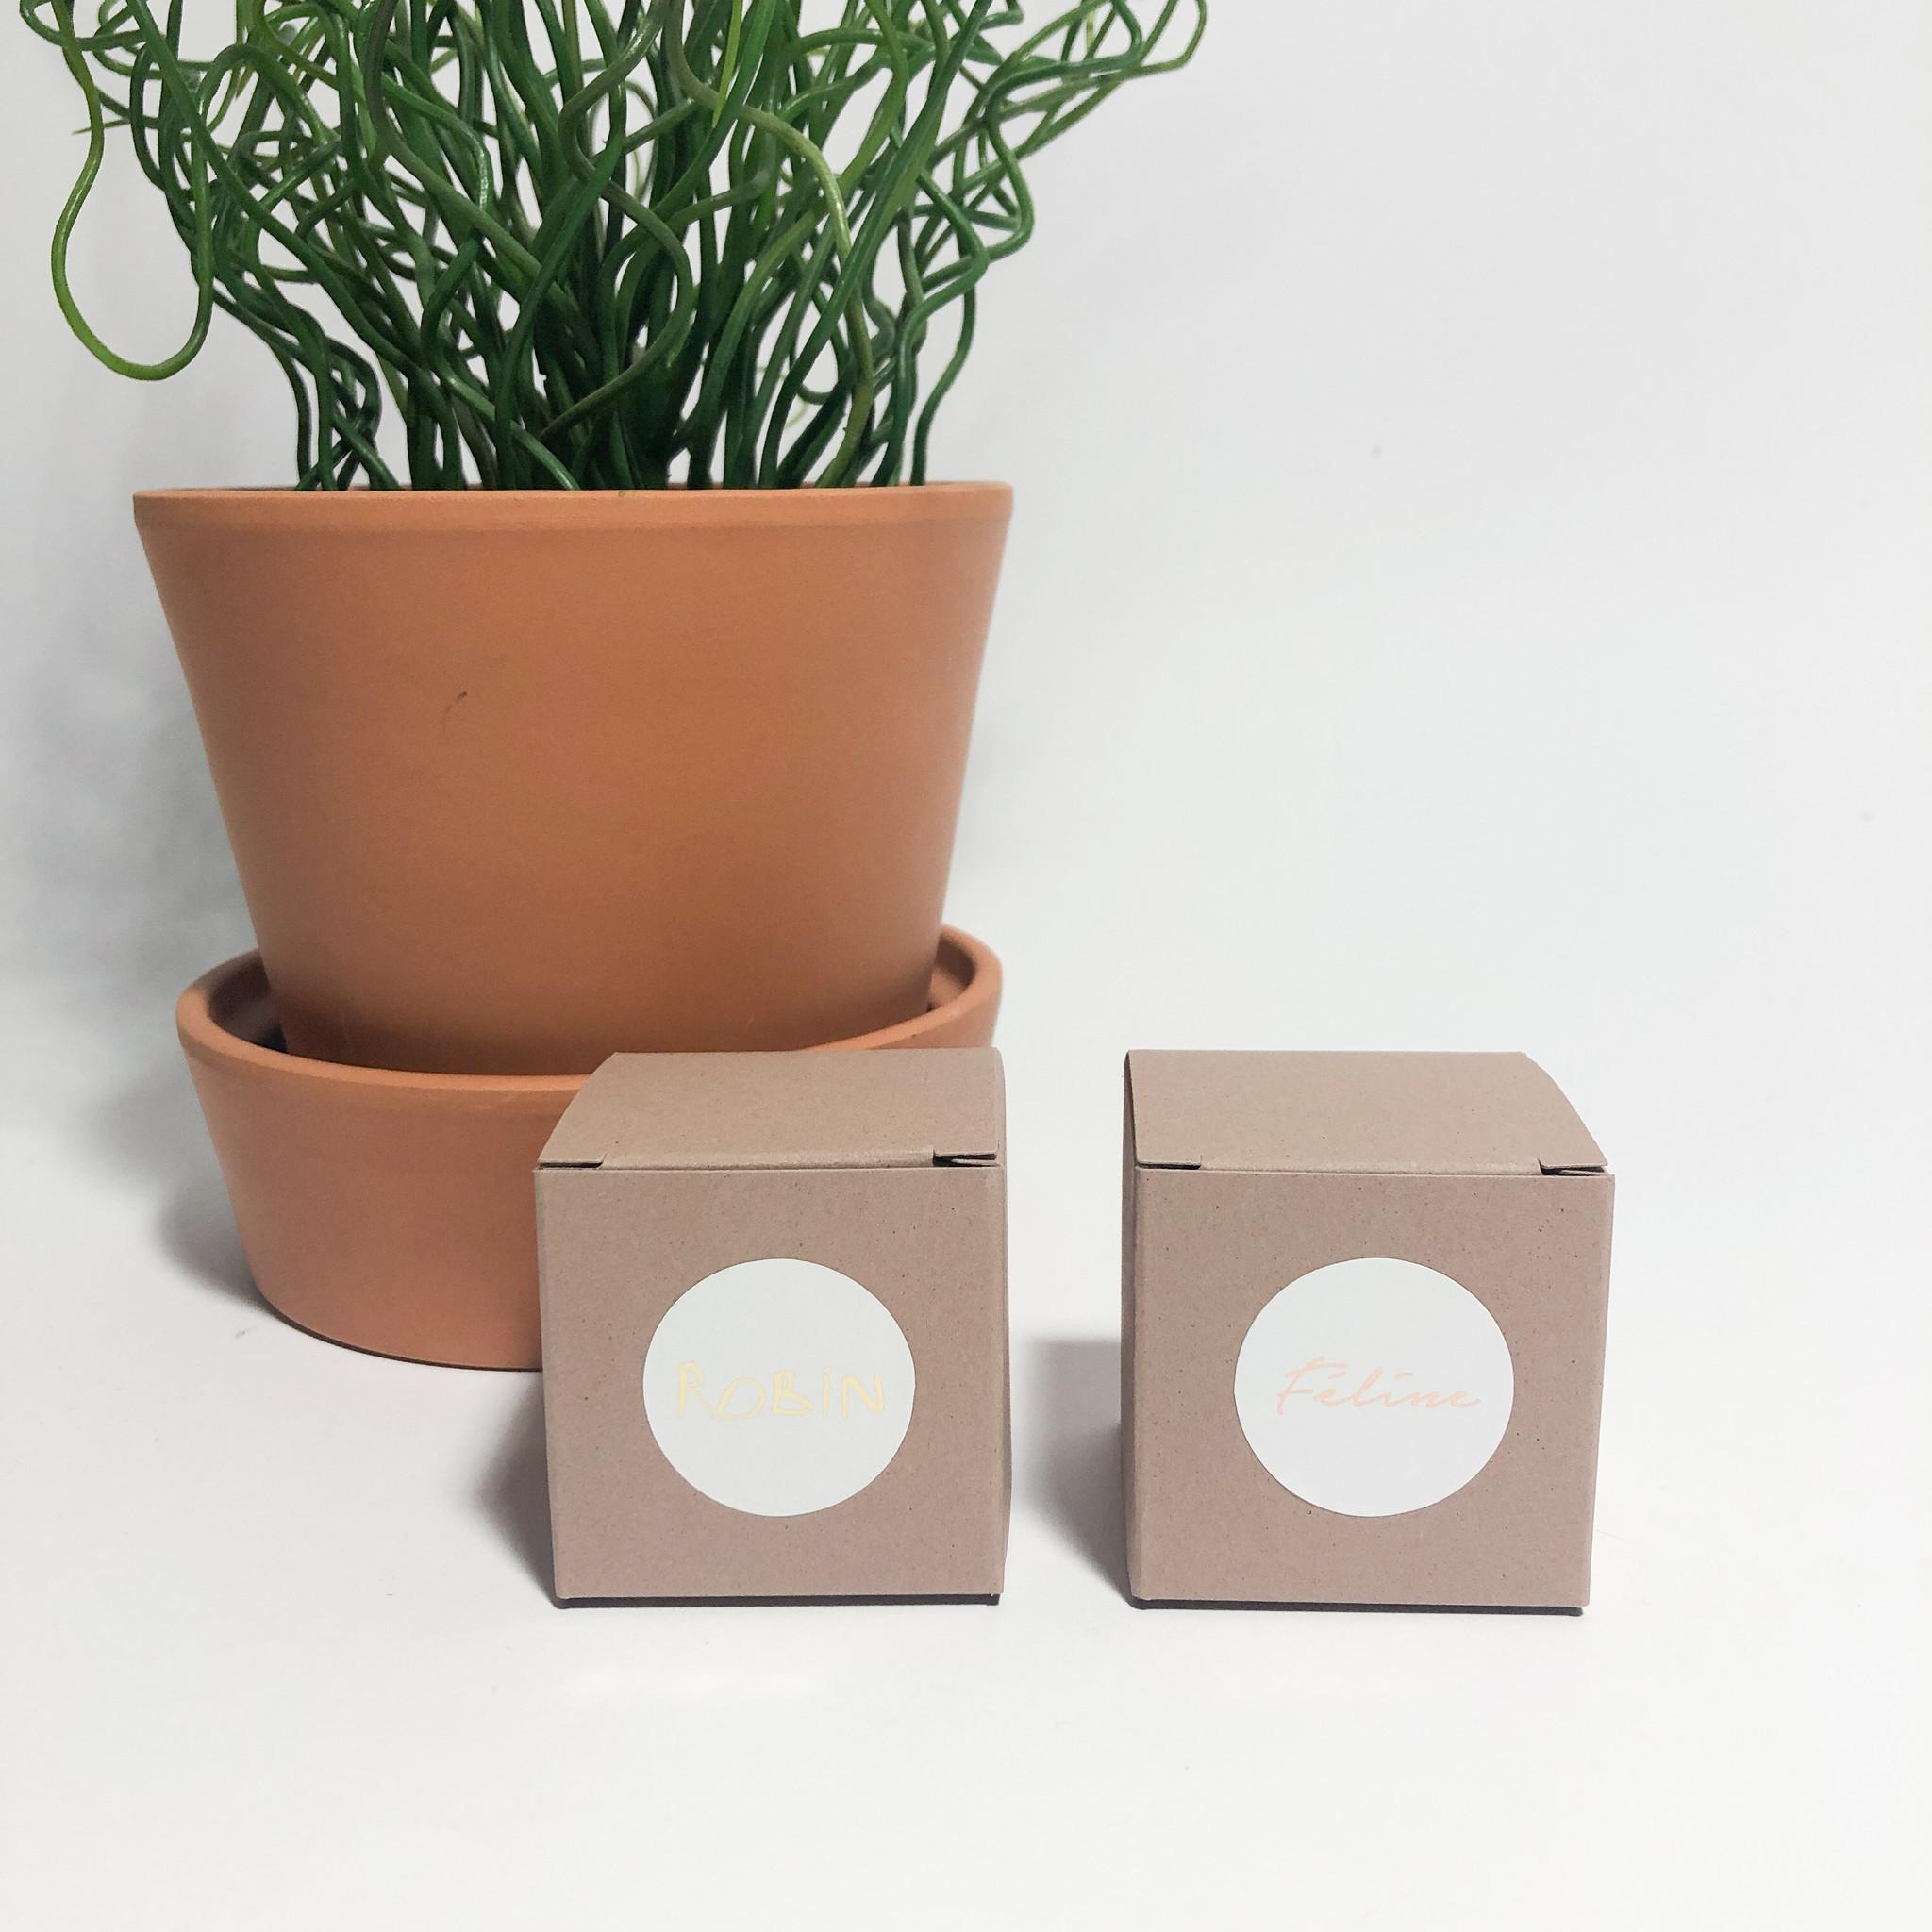 Ronde sticker 3cm met foliedruk